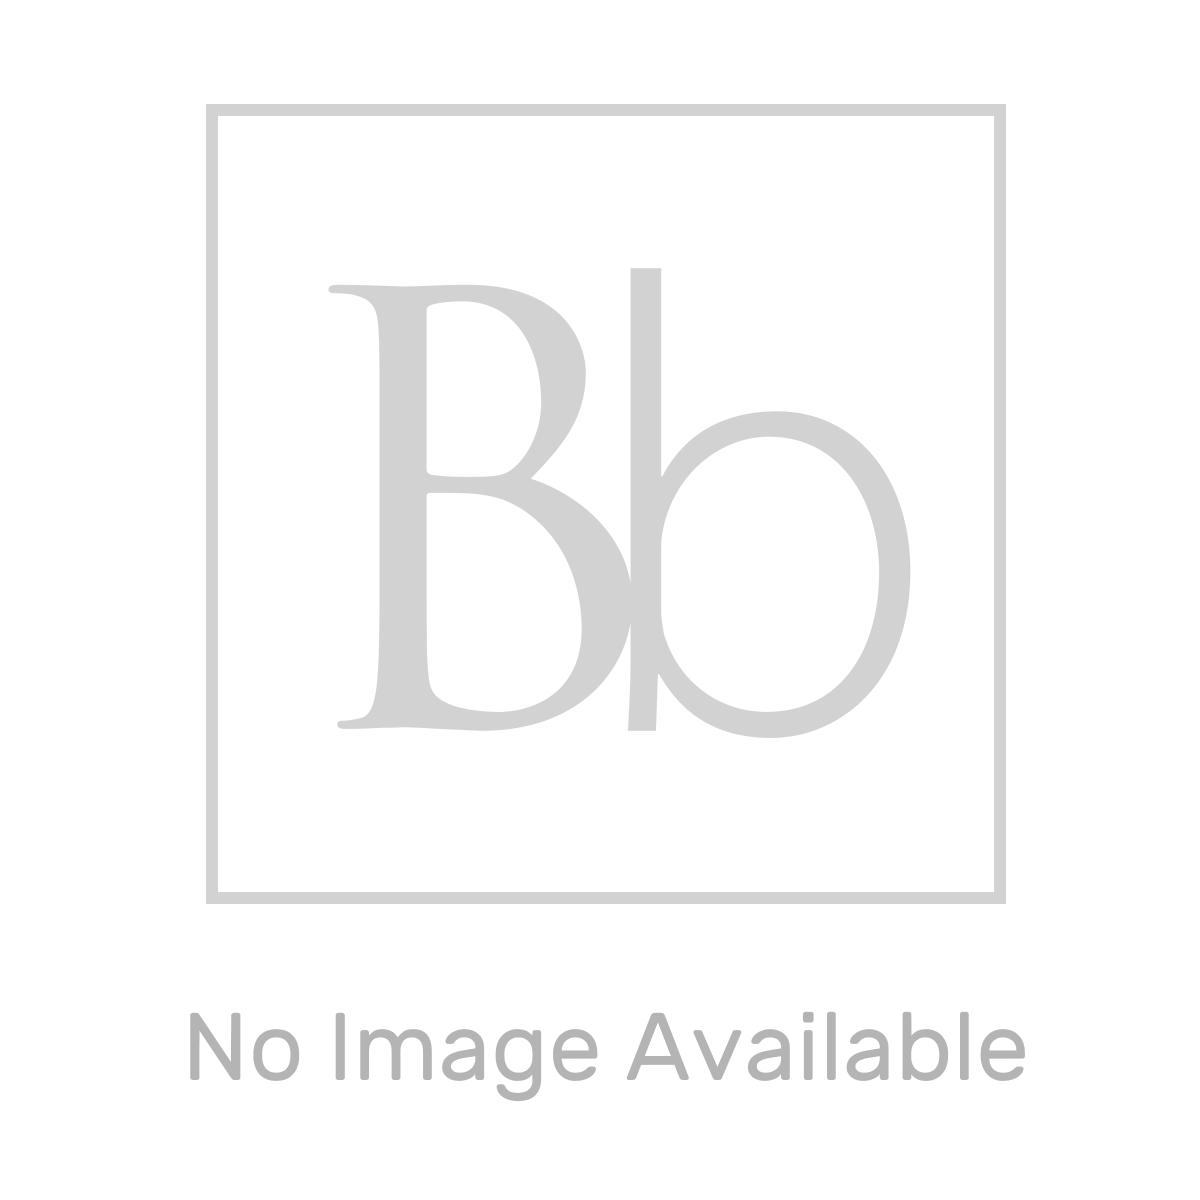 Premier Wet Room Shower Enclosure with Optional Side Panel and Return Panel